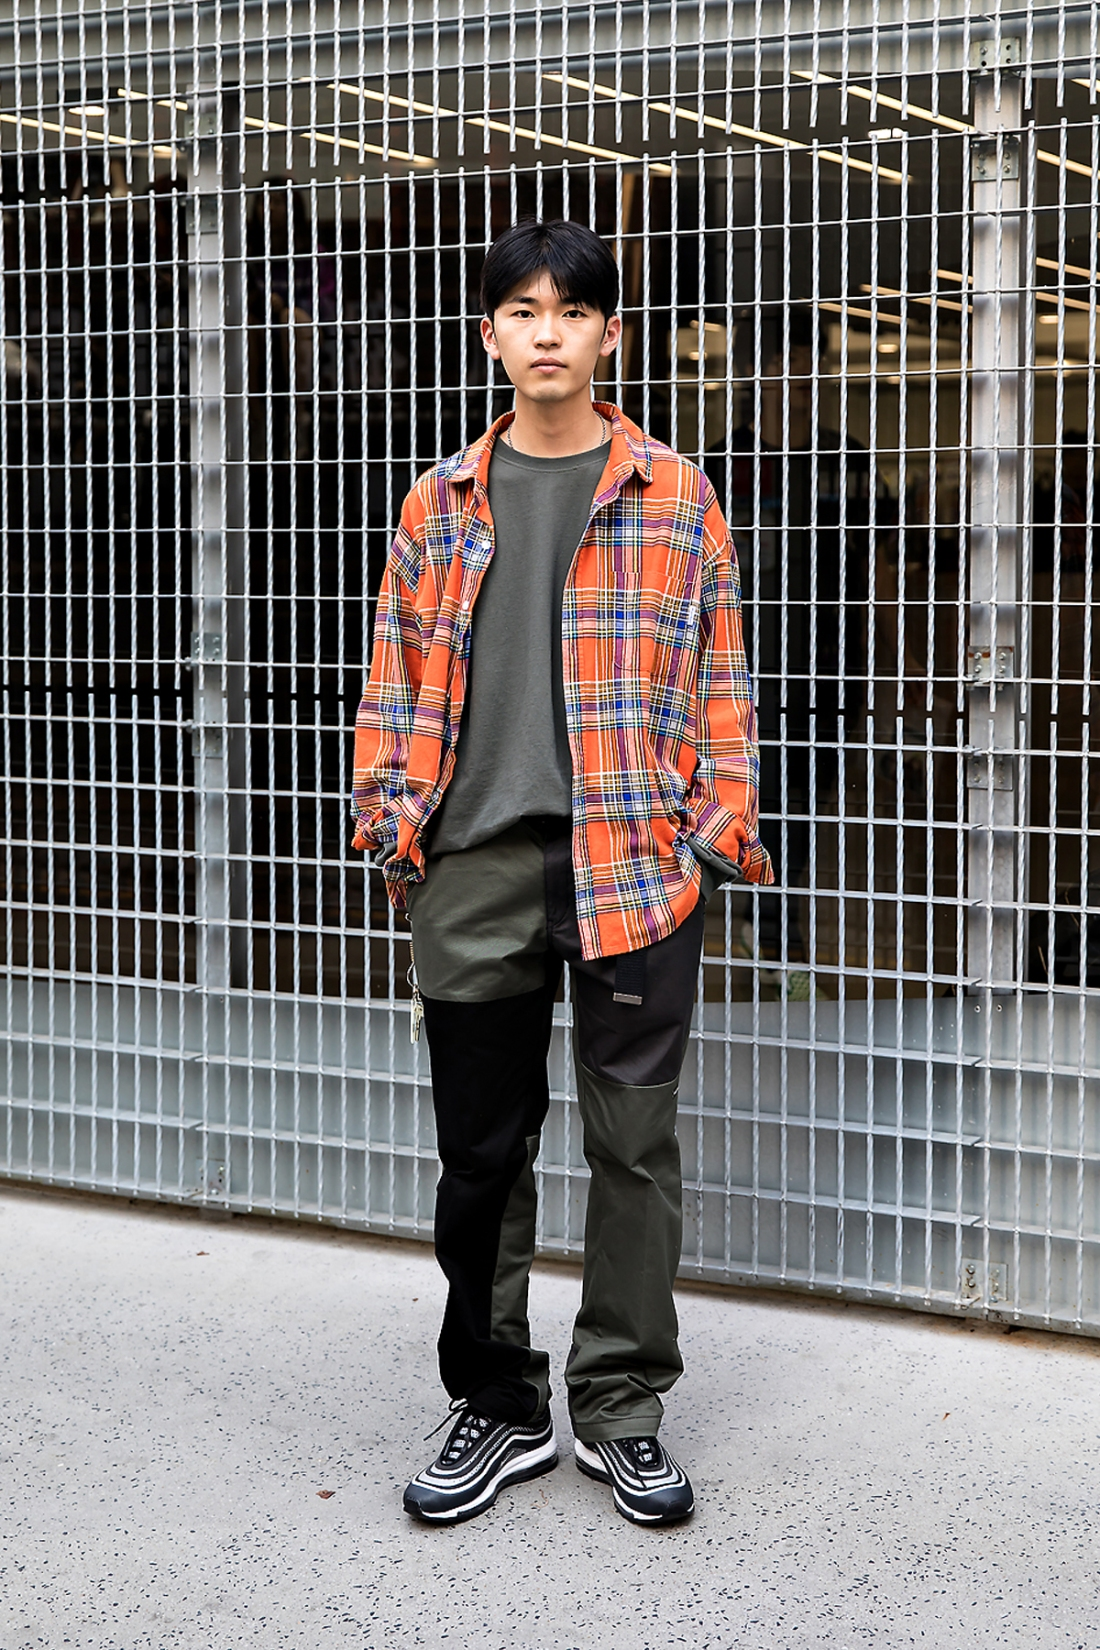 Gu Heekyung, Street Fashion 2017 in Seoul.jpg